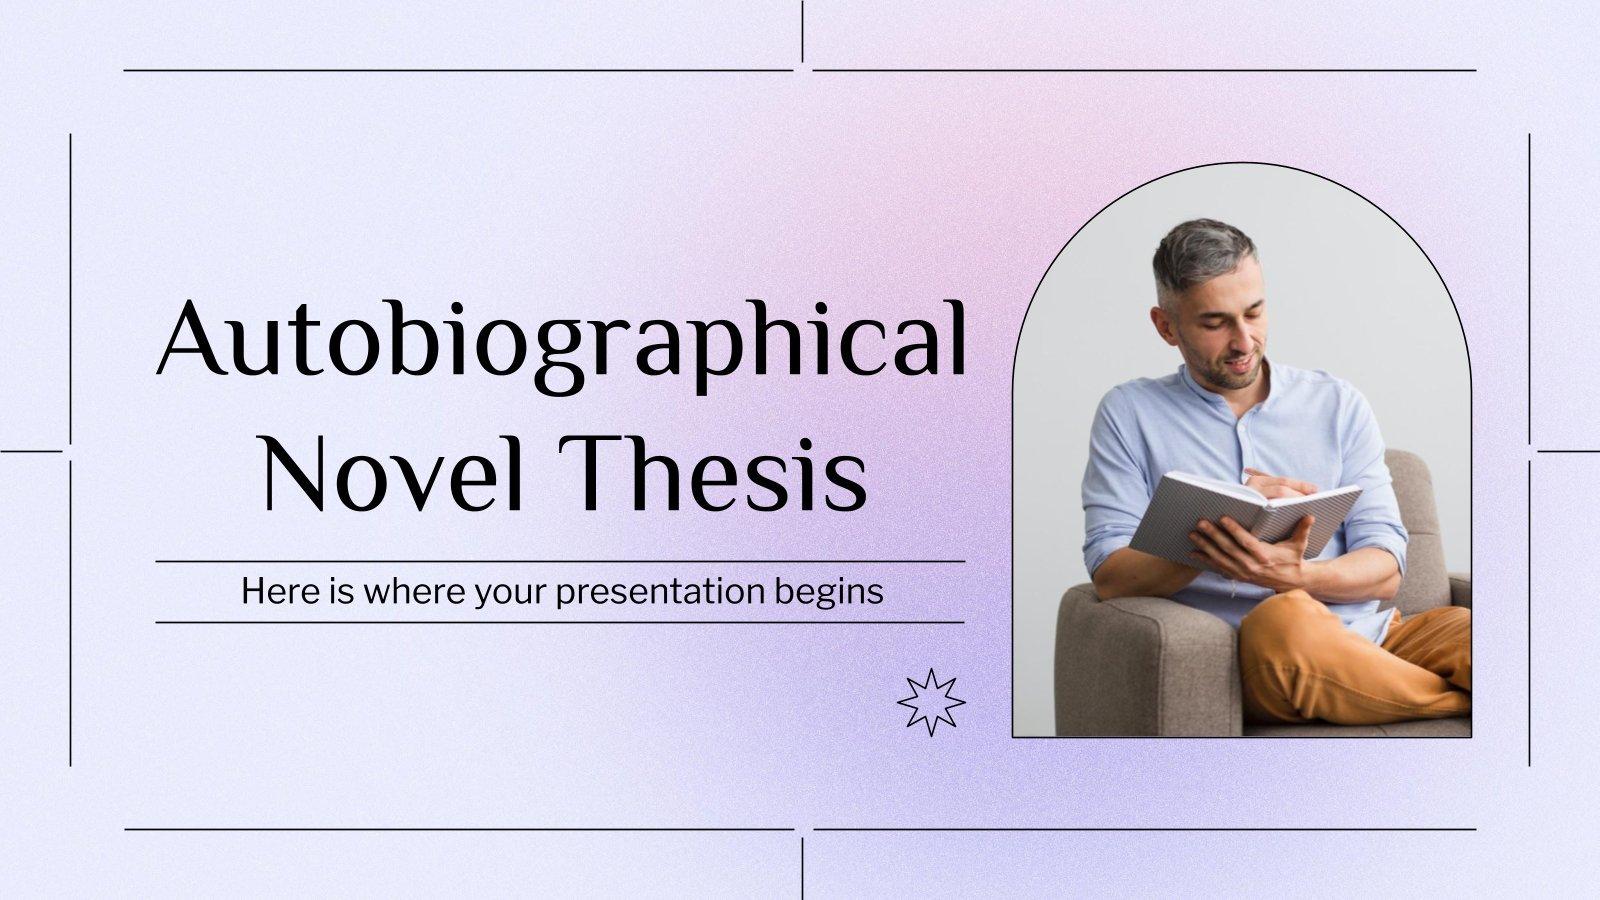 Autobiographical Novel Thesis presentation template